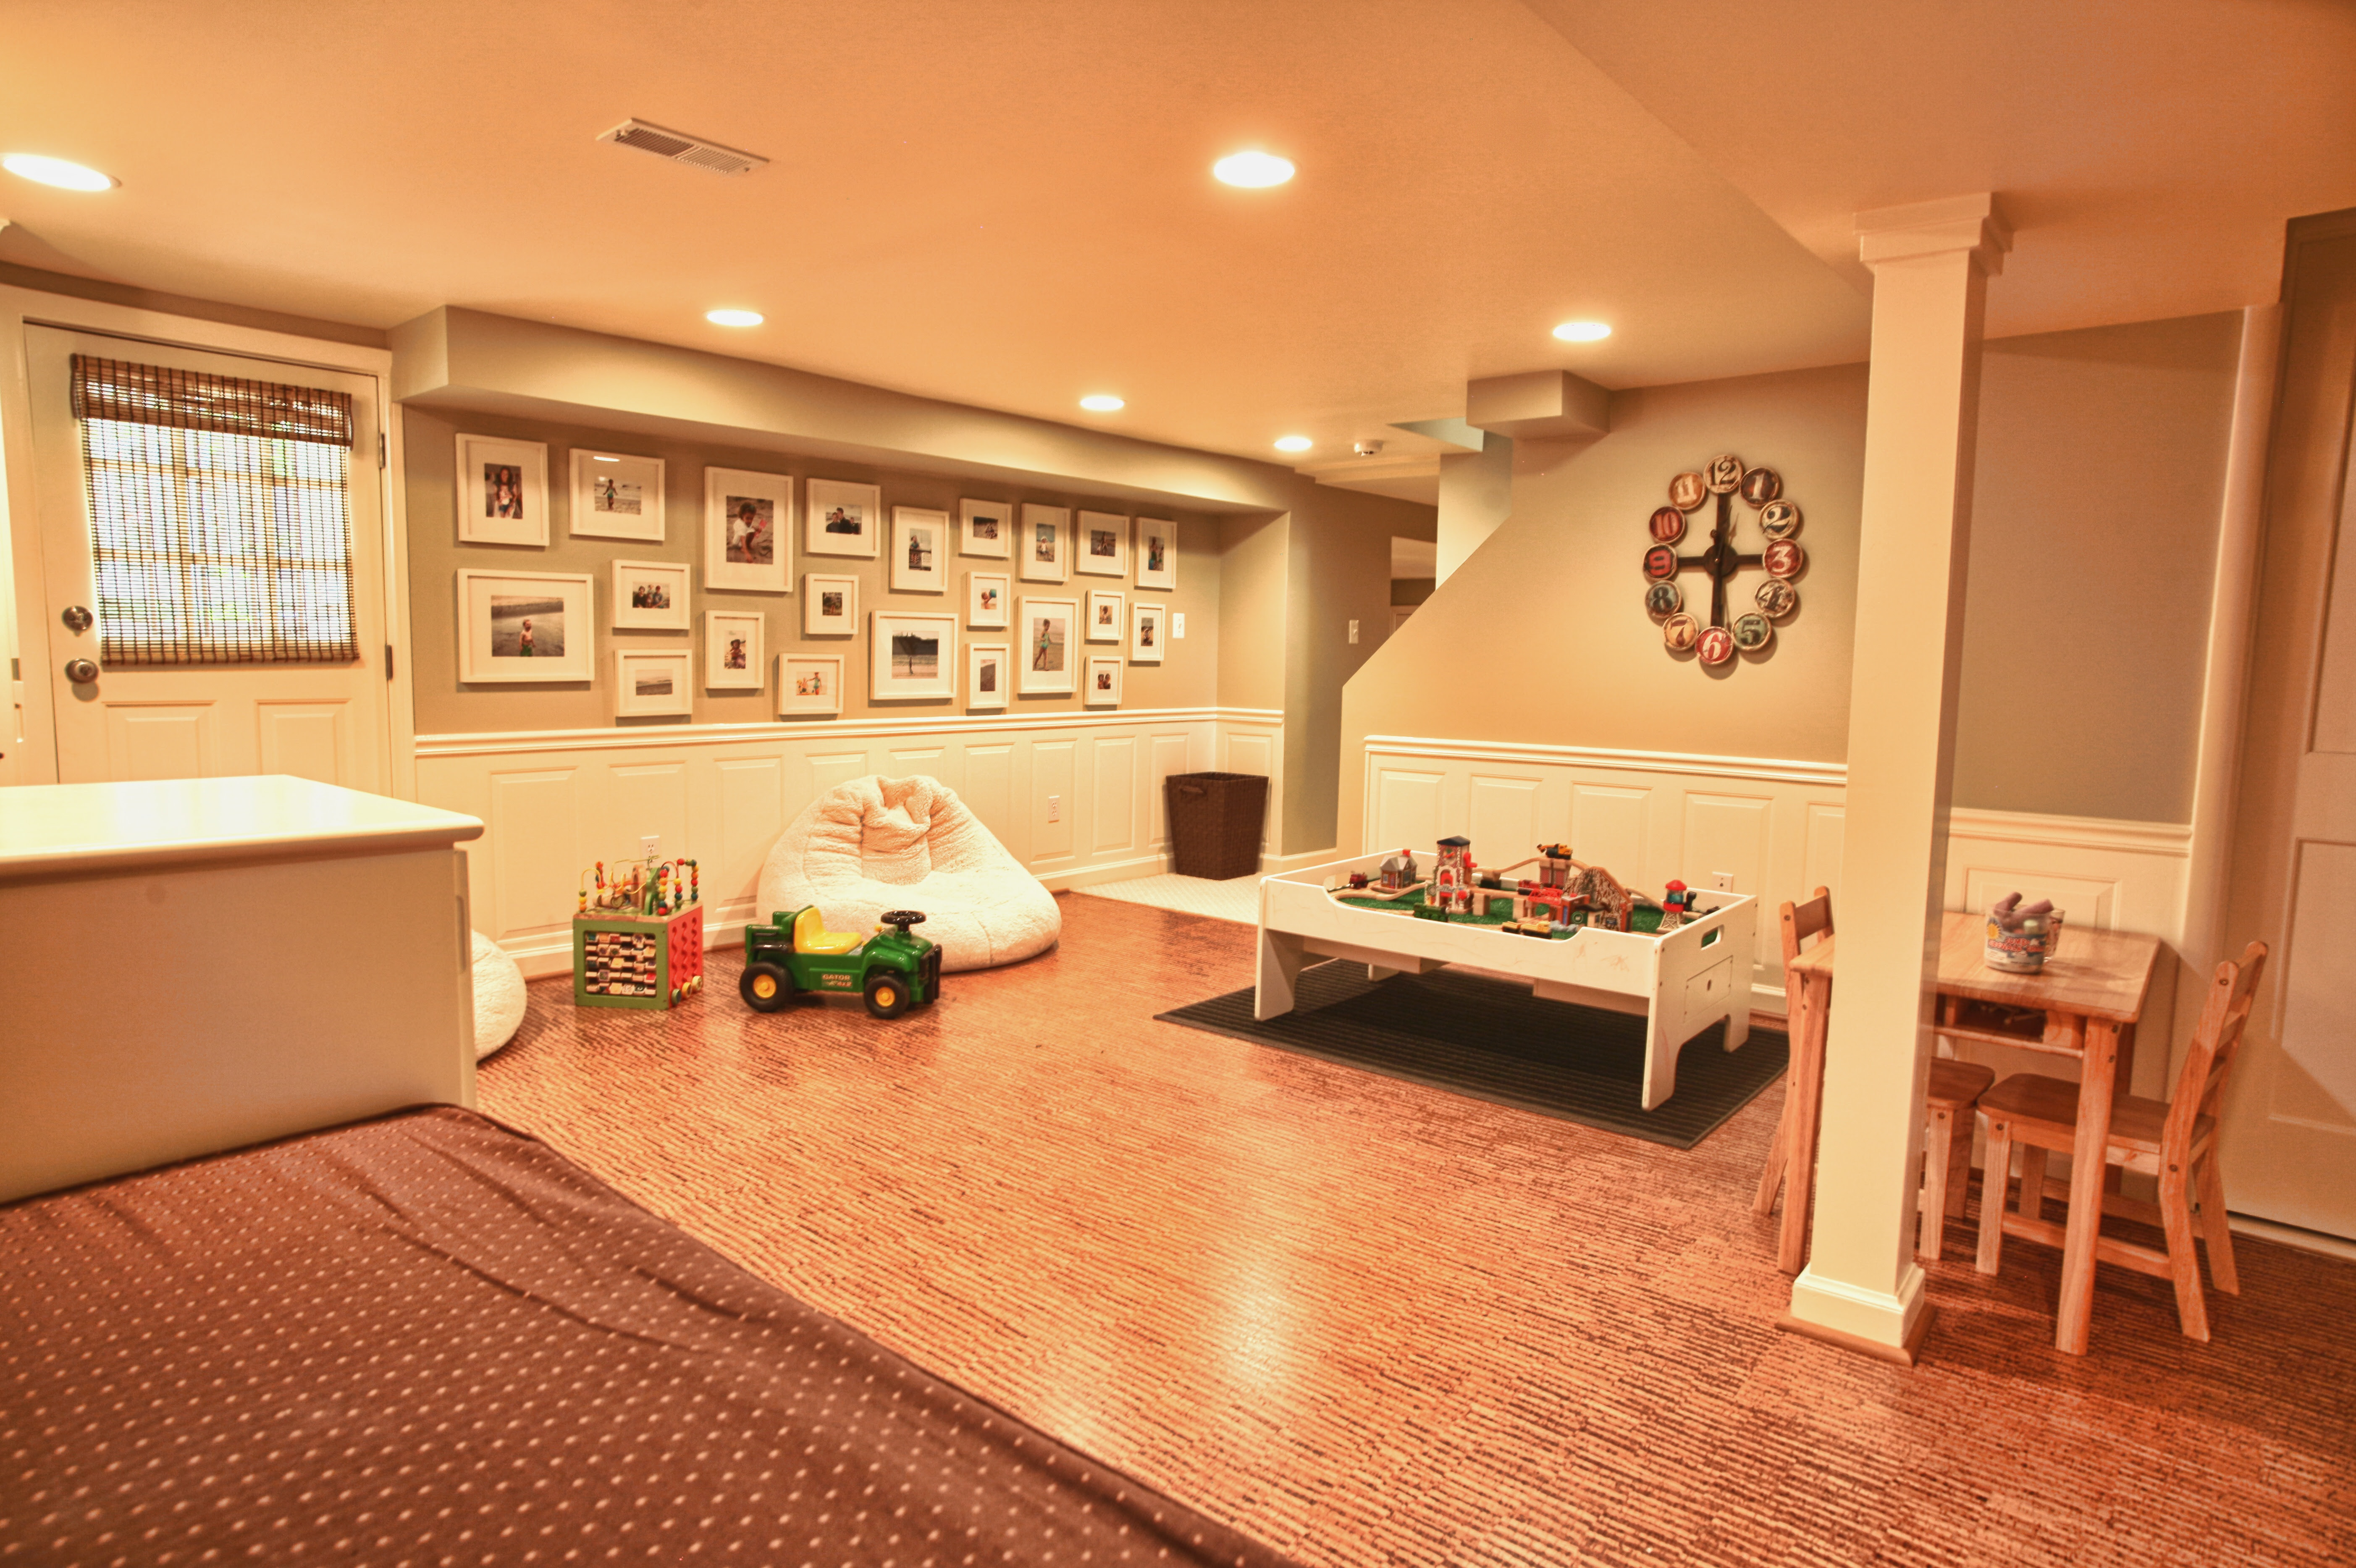 Eco-Friendly Children's Play Room Basement Redesign | Kreative ...